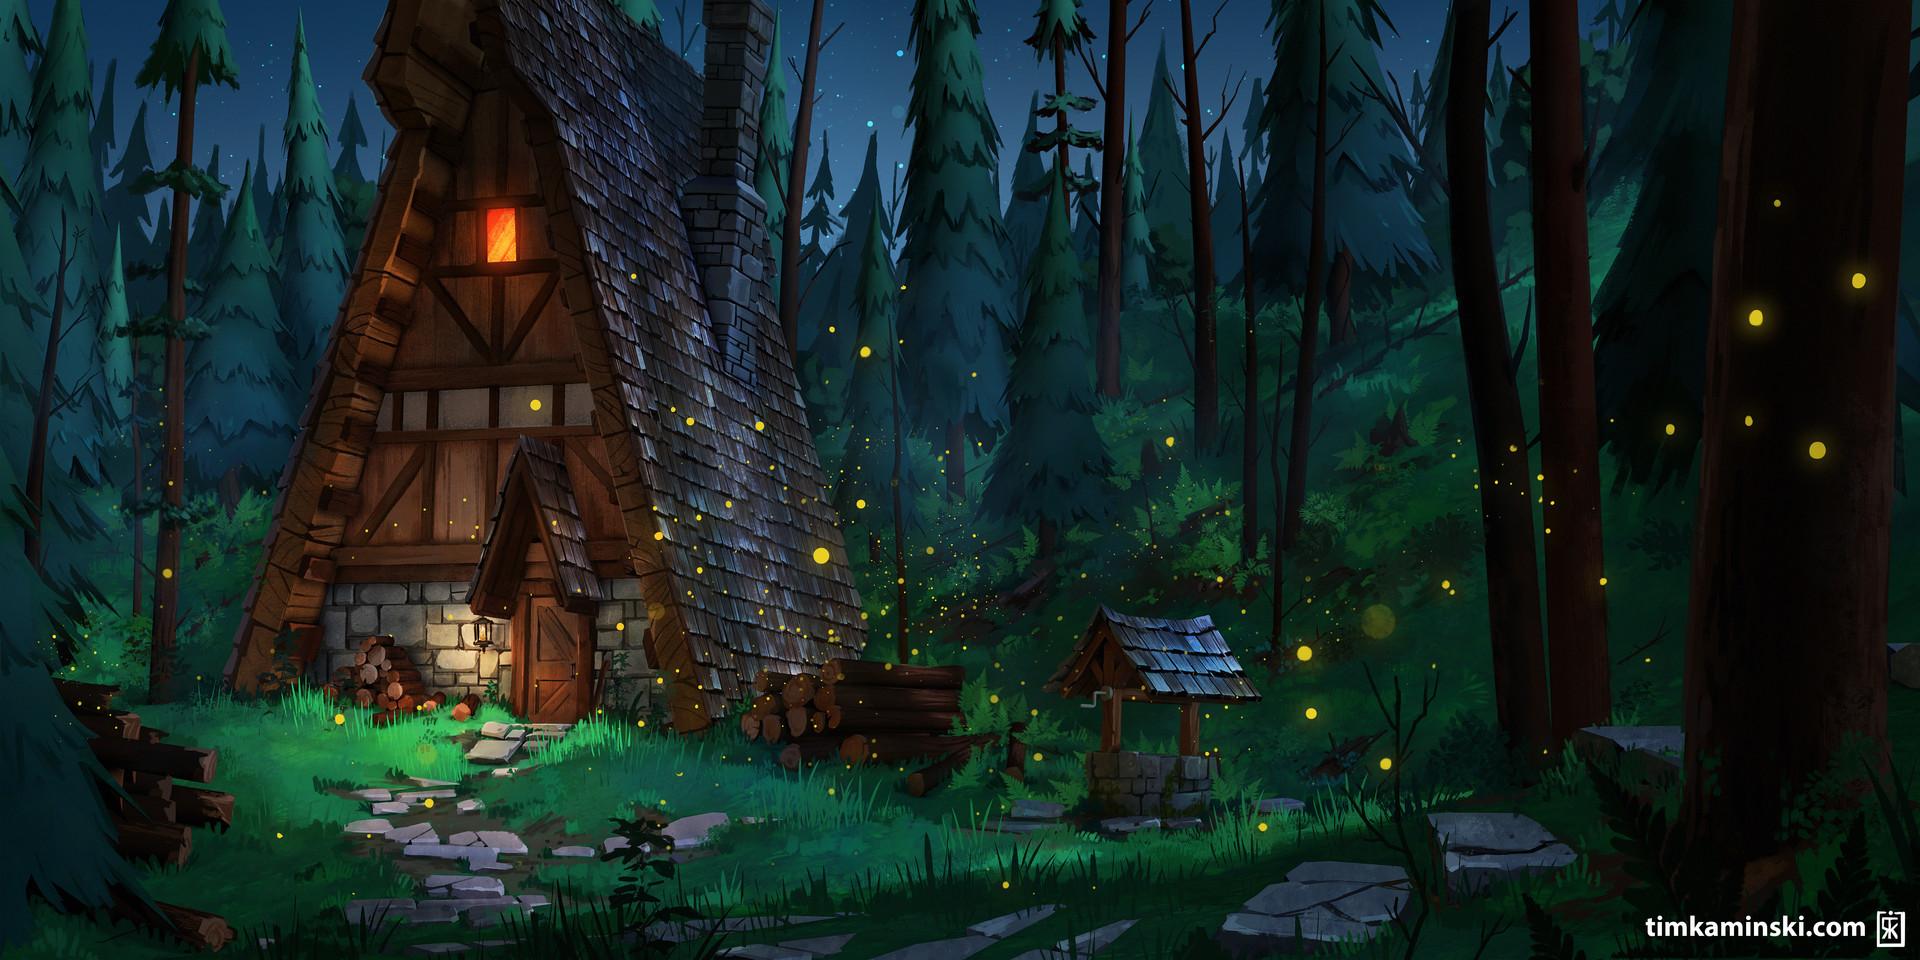 Tim kaminski forest cabin happy